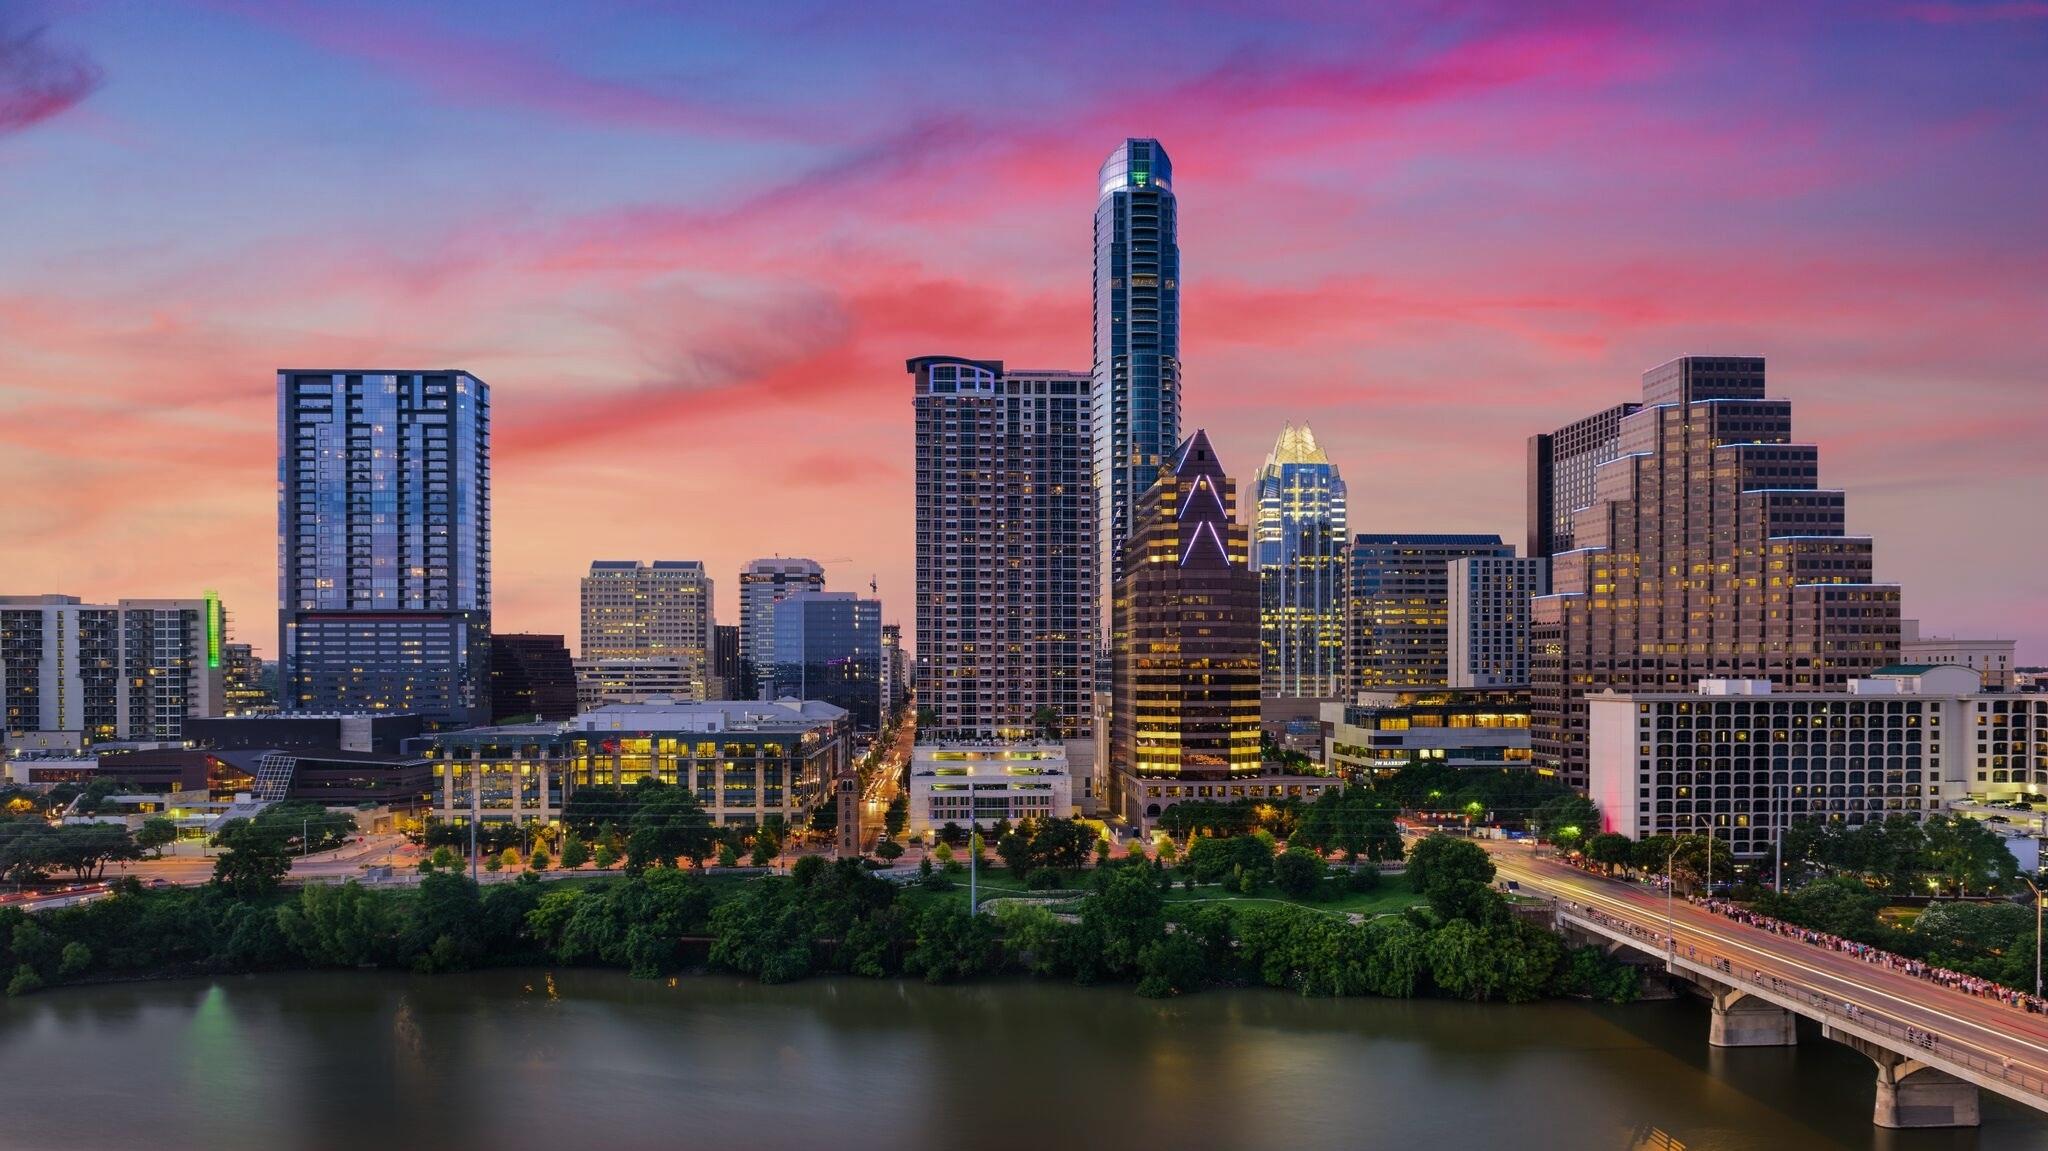 Austin - Welcomes BYU Alumni and Friends